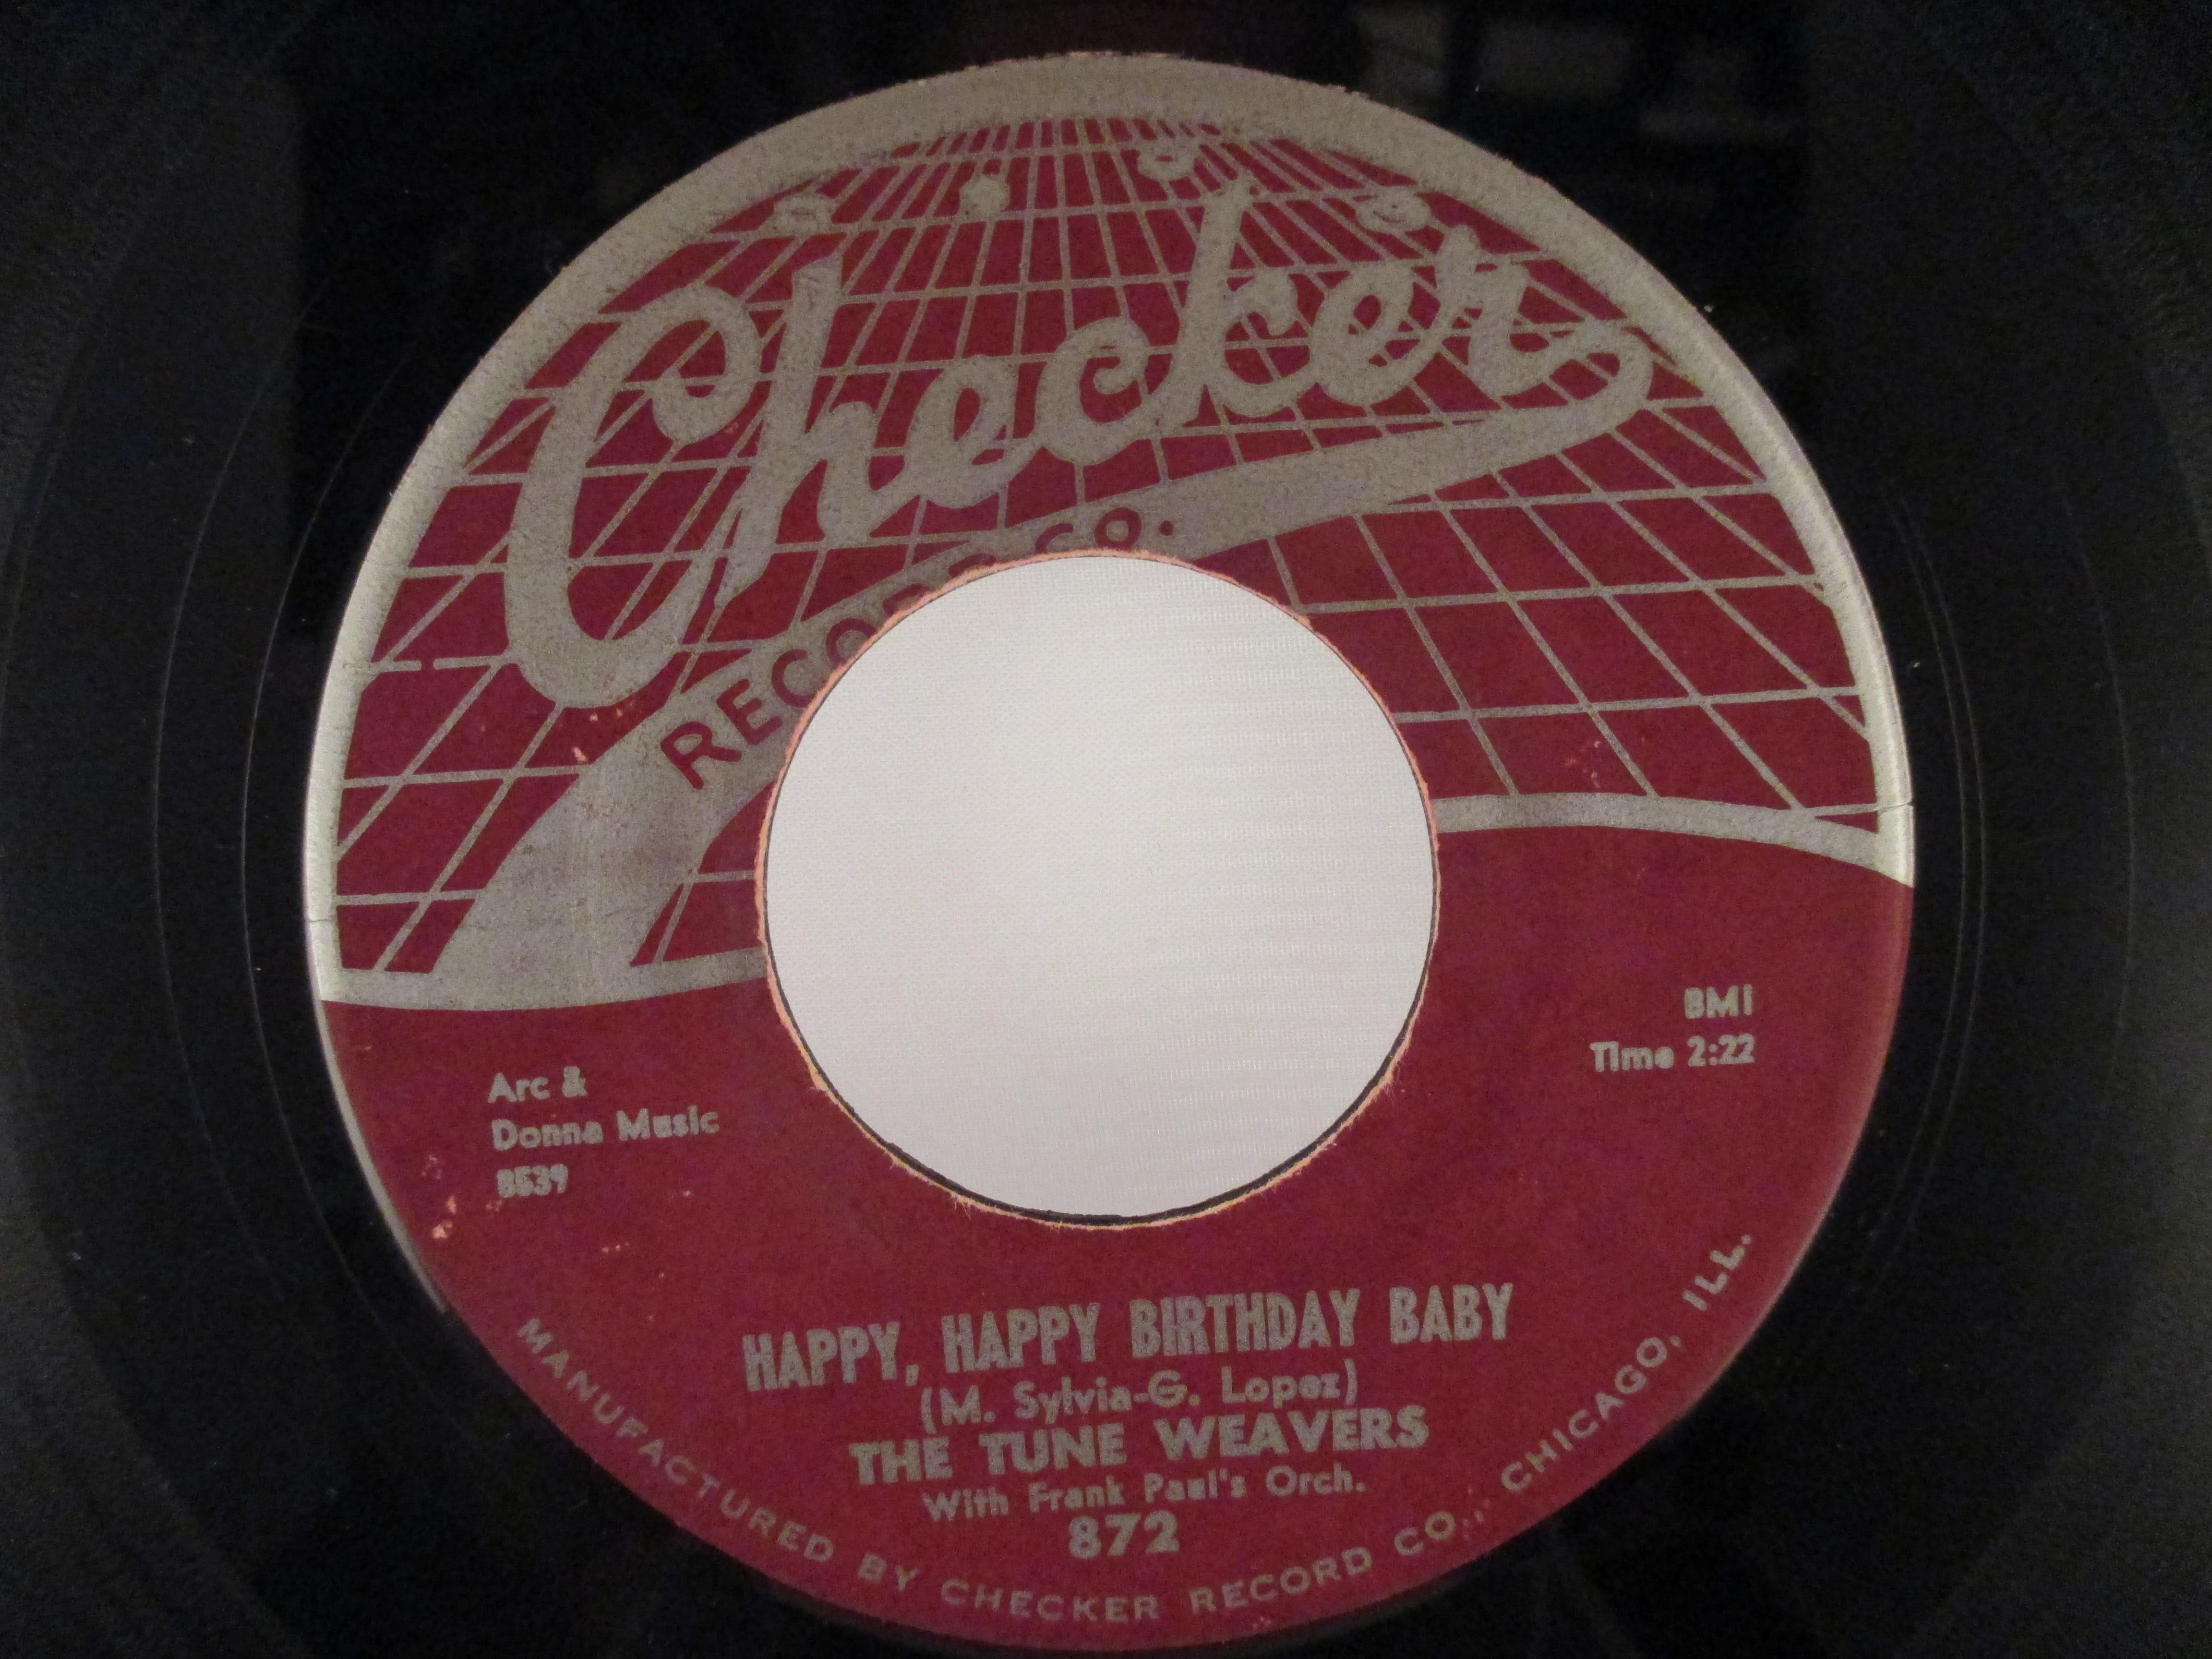 TUNE WEAVERS : Happy, happy birthday baby / Ol man river